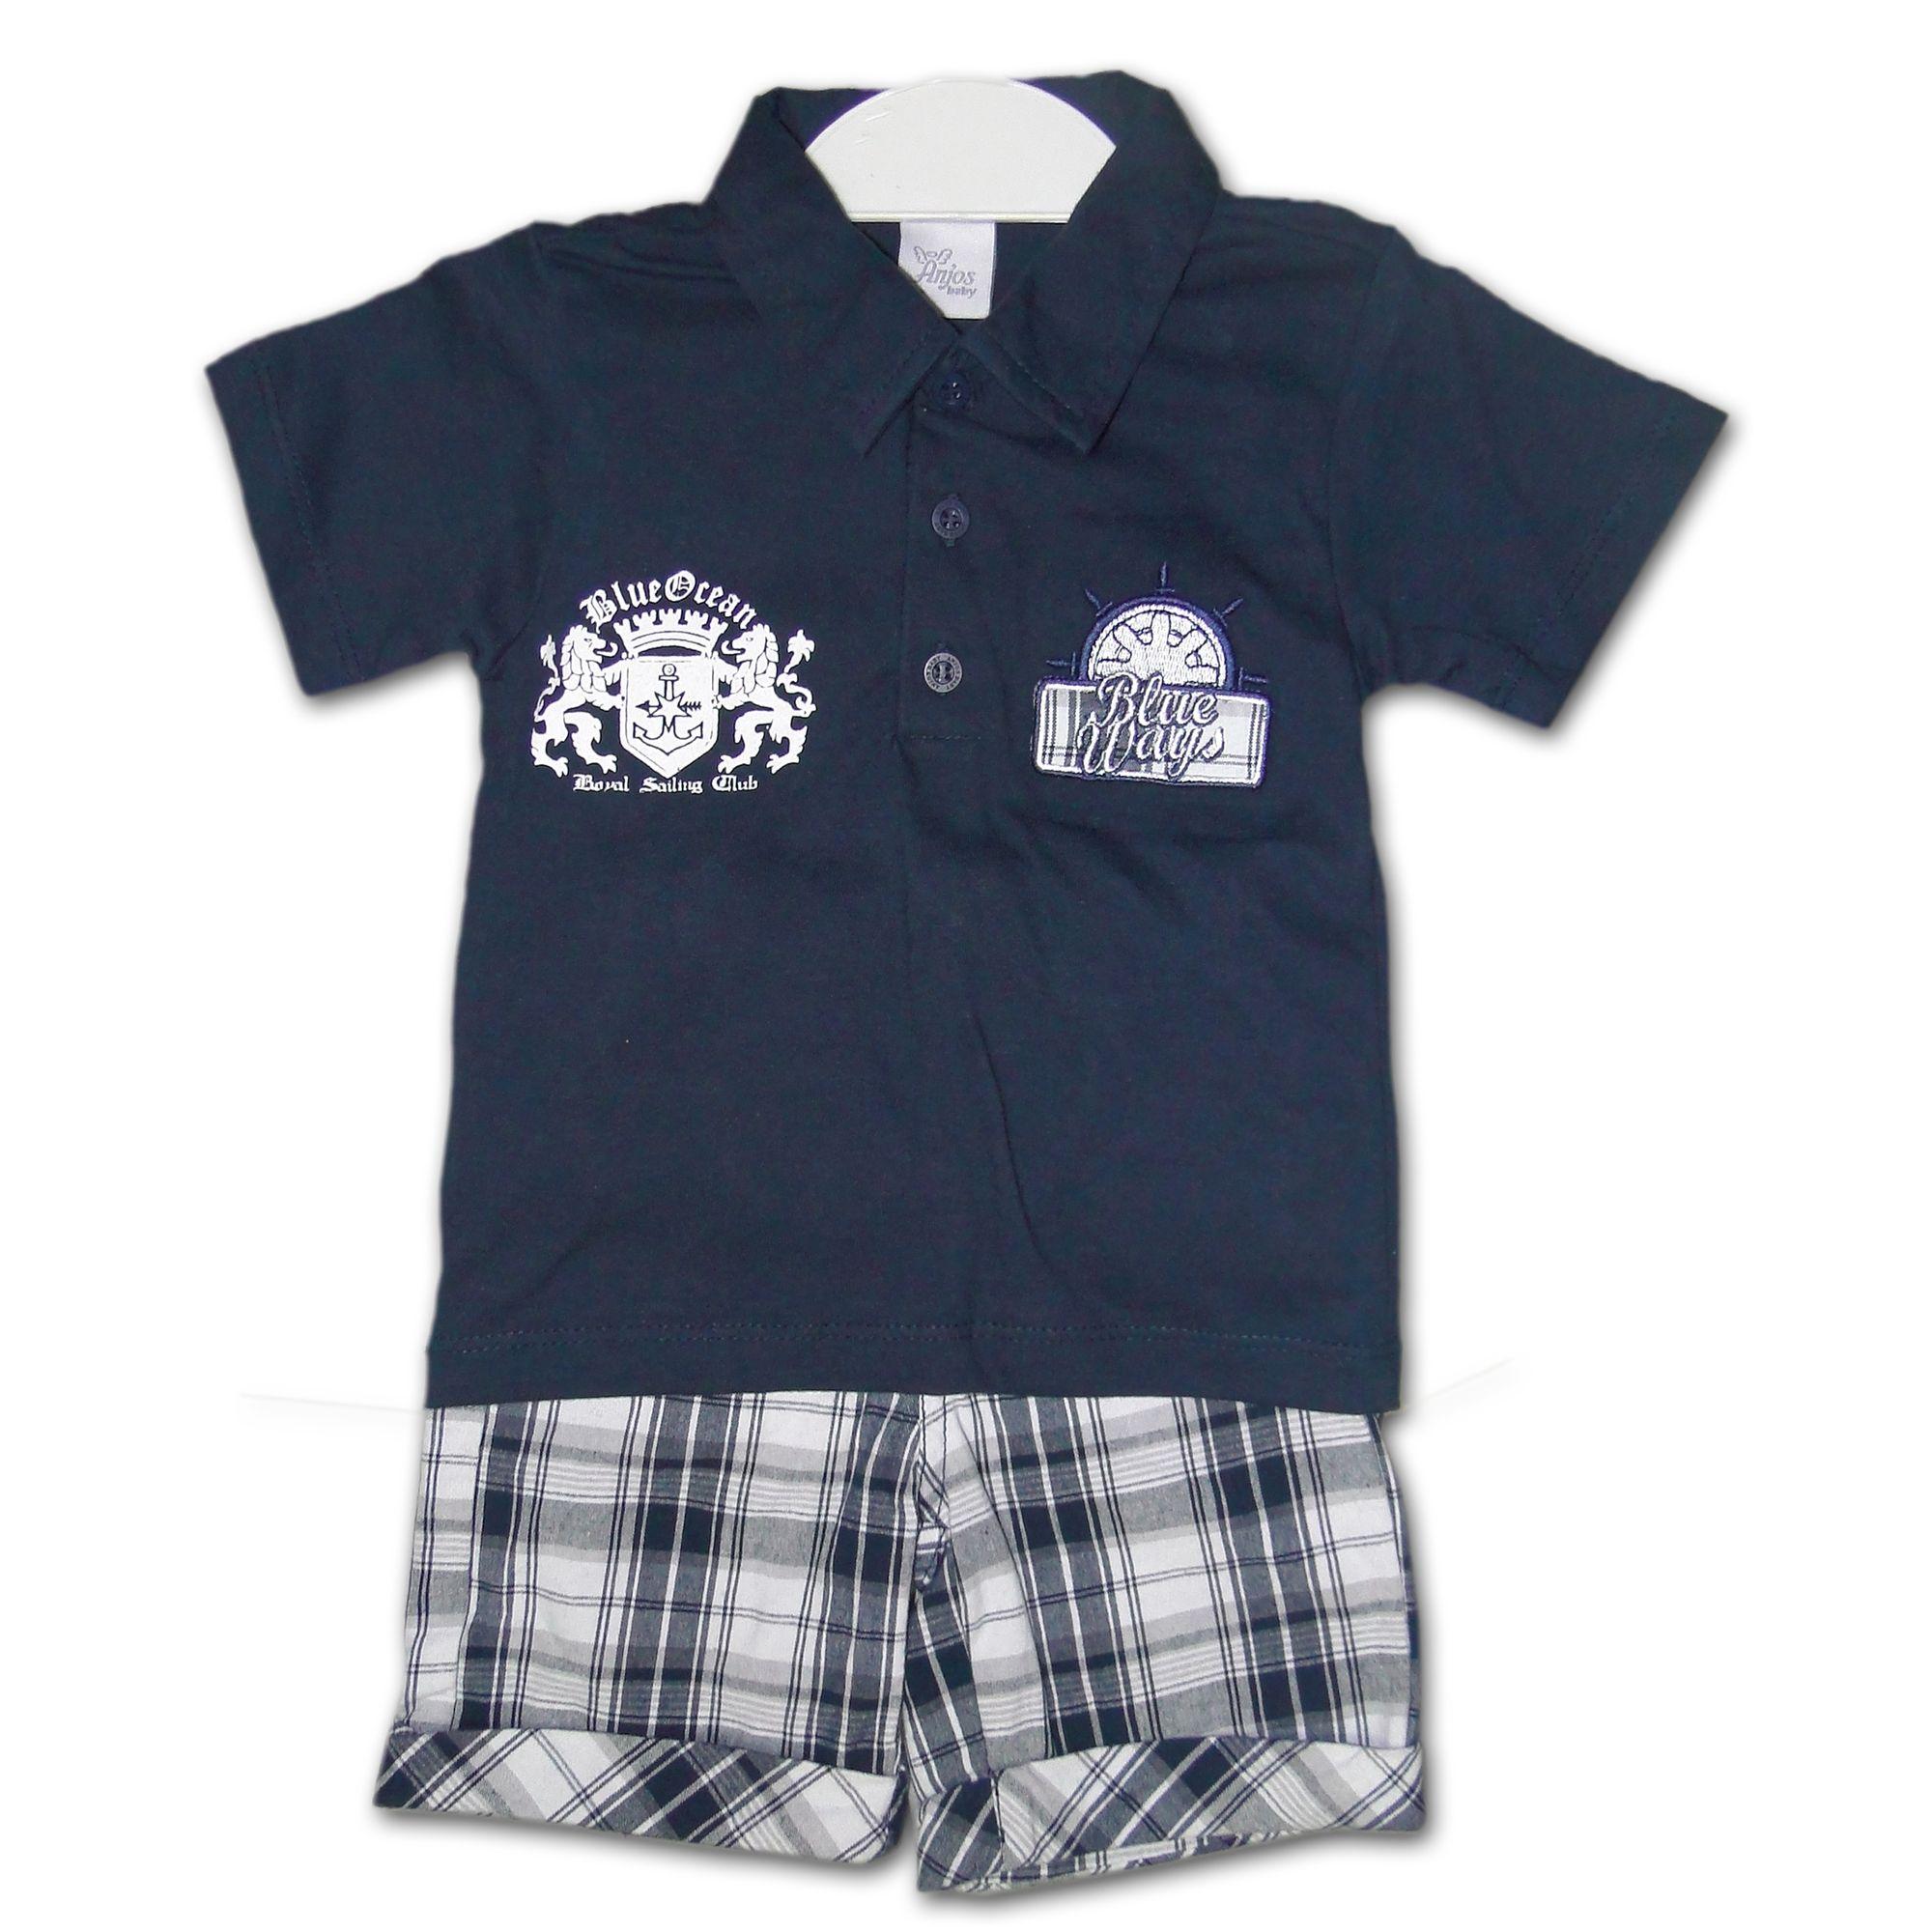 Conjunto Infantil Camisa Pólo Azul Marinho e Bermuda Xadrez - EcaMeleca cfa573e338525